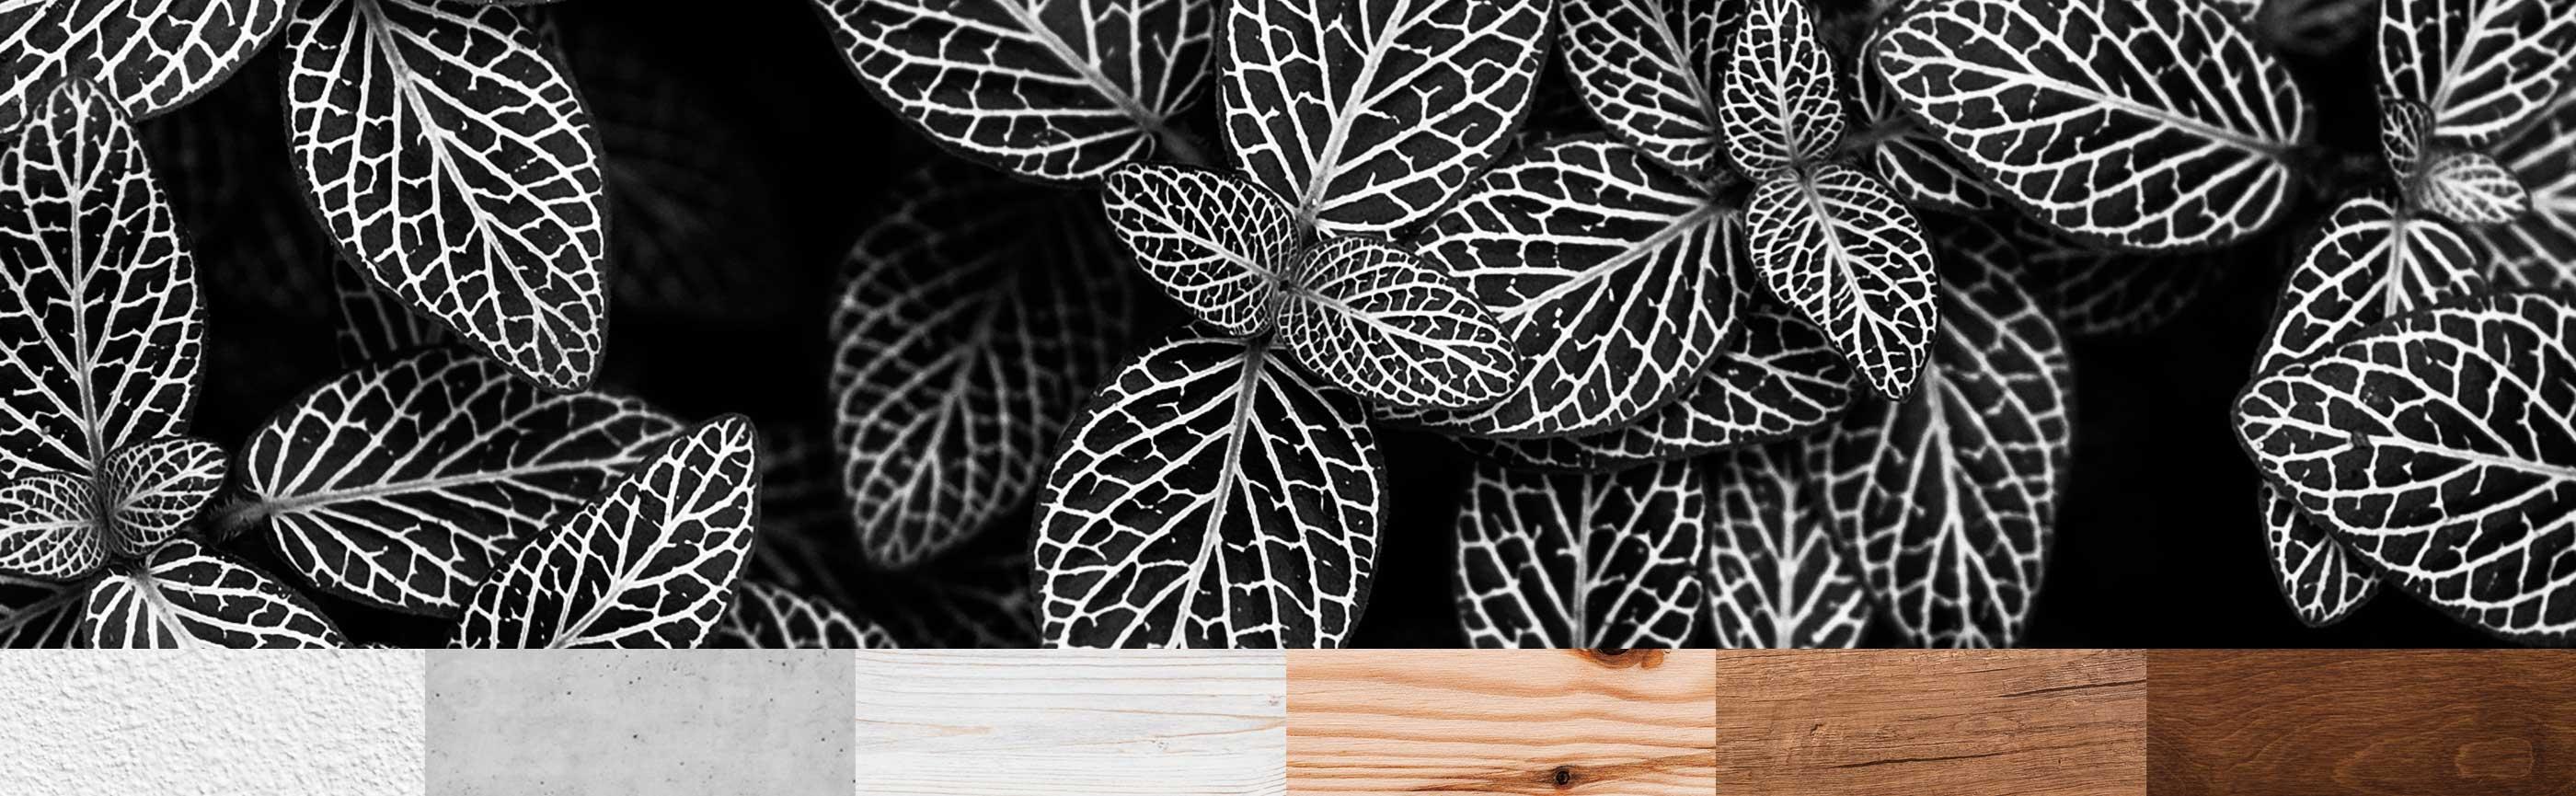 Naturmaterial Holz